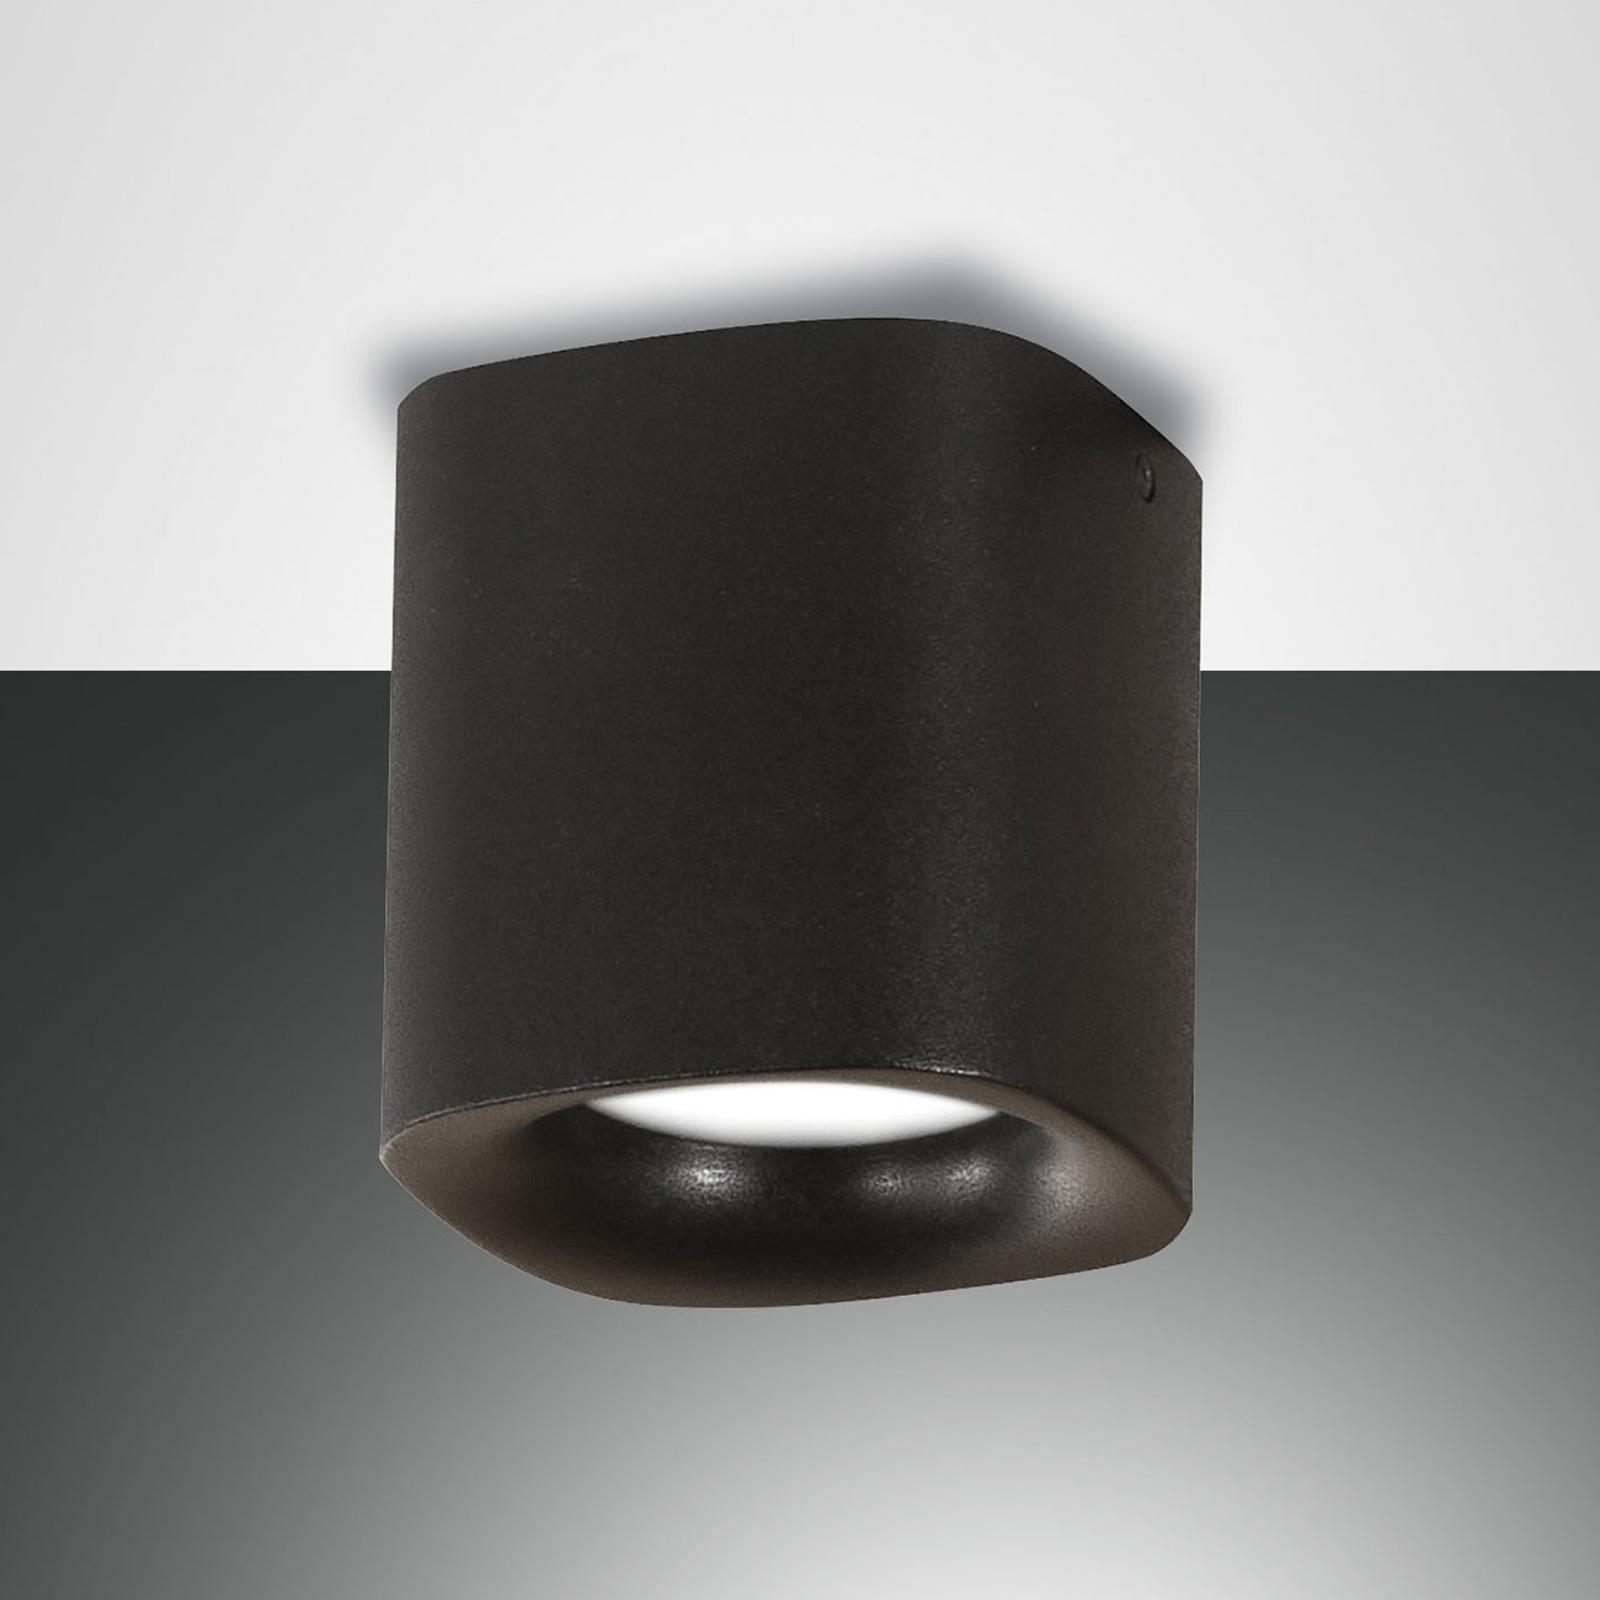 Lampa sufitowa Smooth, 1-punktowa, czarna, IP44